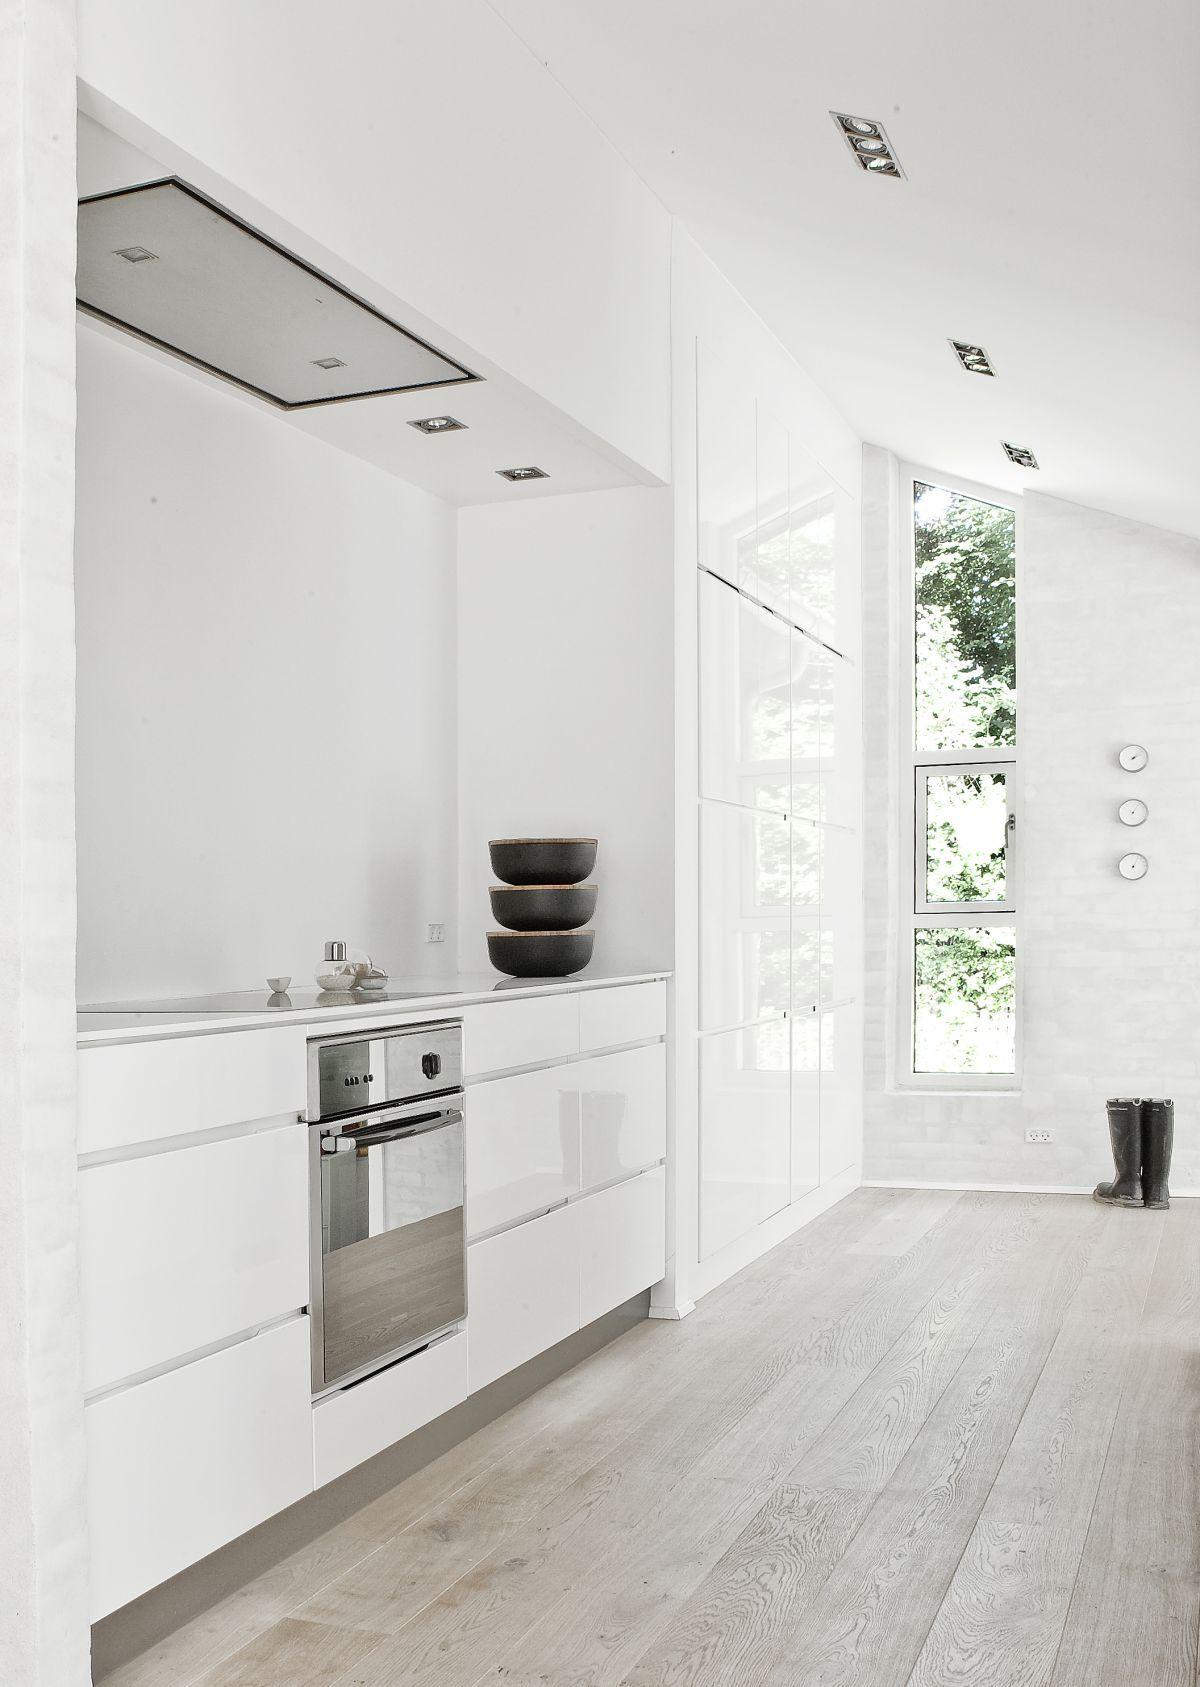 Grandiose White Galley Kitchen Decors With White Acrylic Cabinet